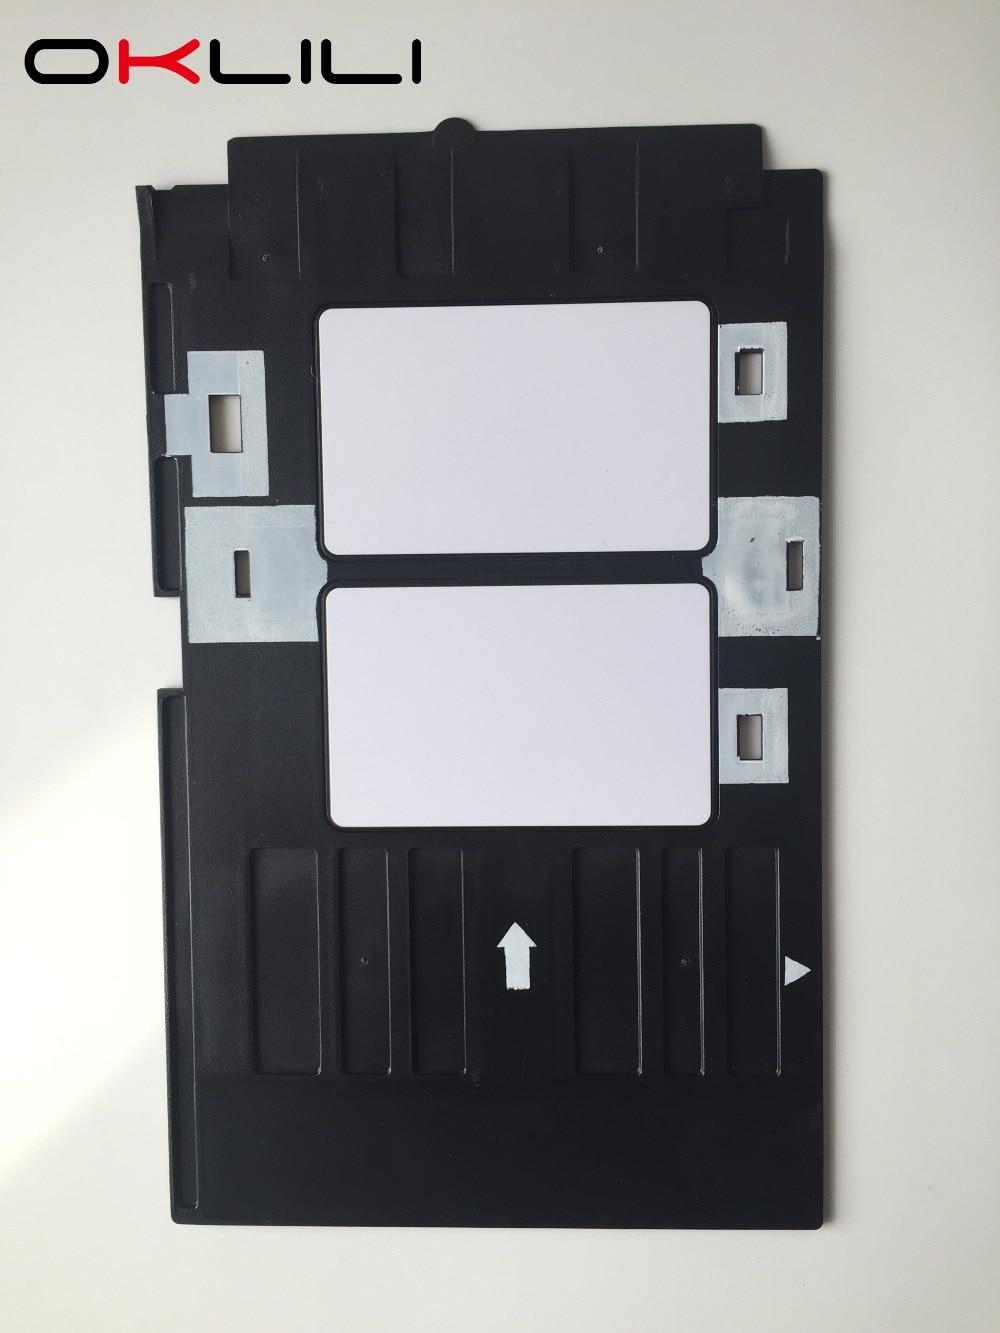 PVC ID kartes paplātes plastmasas karte Drukas tekne Epson R260 R265 R270 R280 R290 R380 R390 RX680 T50 T60 A50 P50 L800 L801 R330